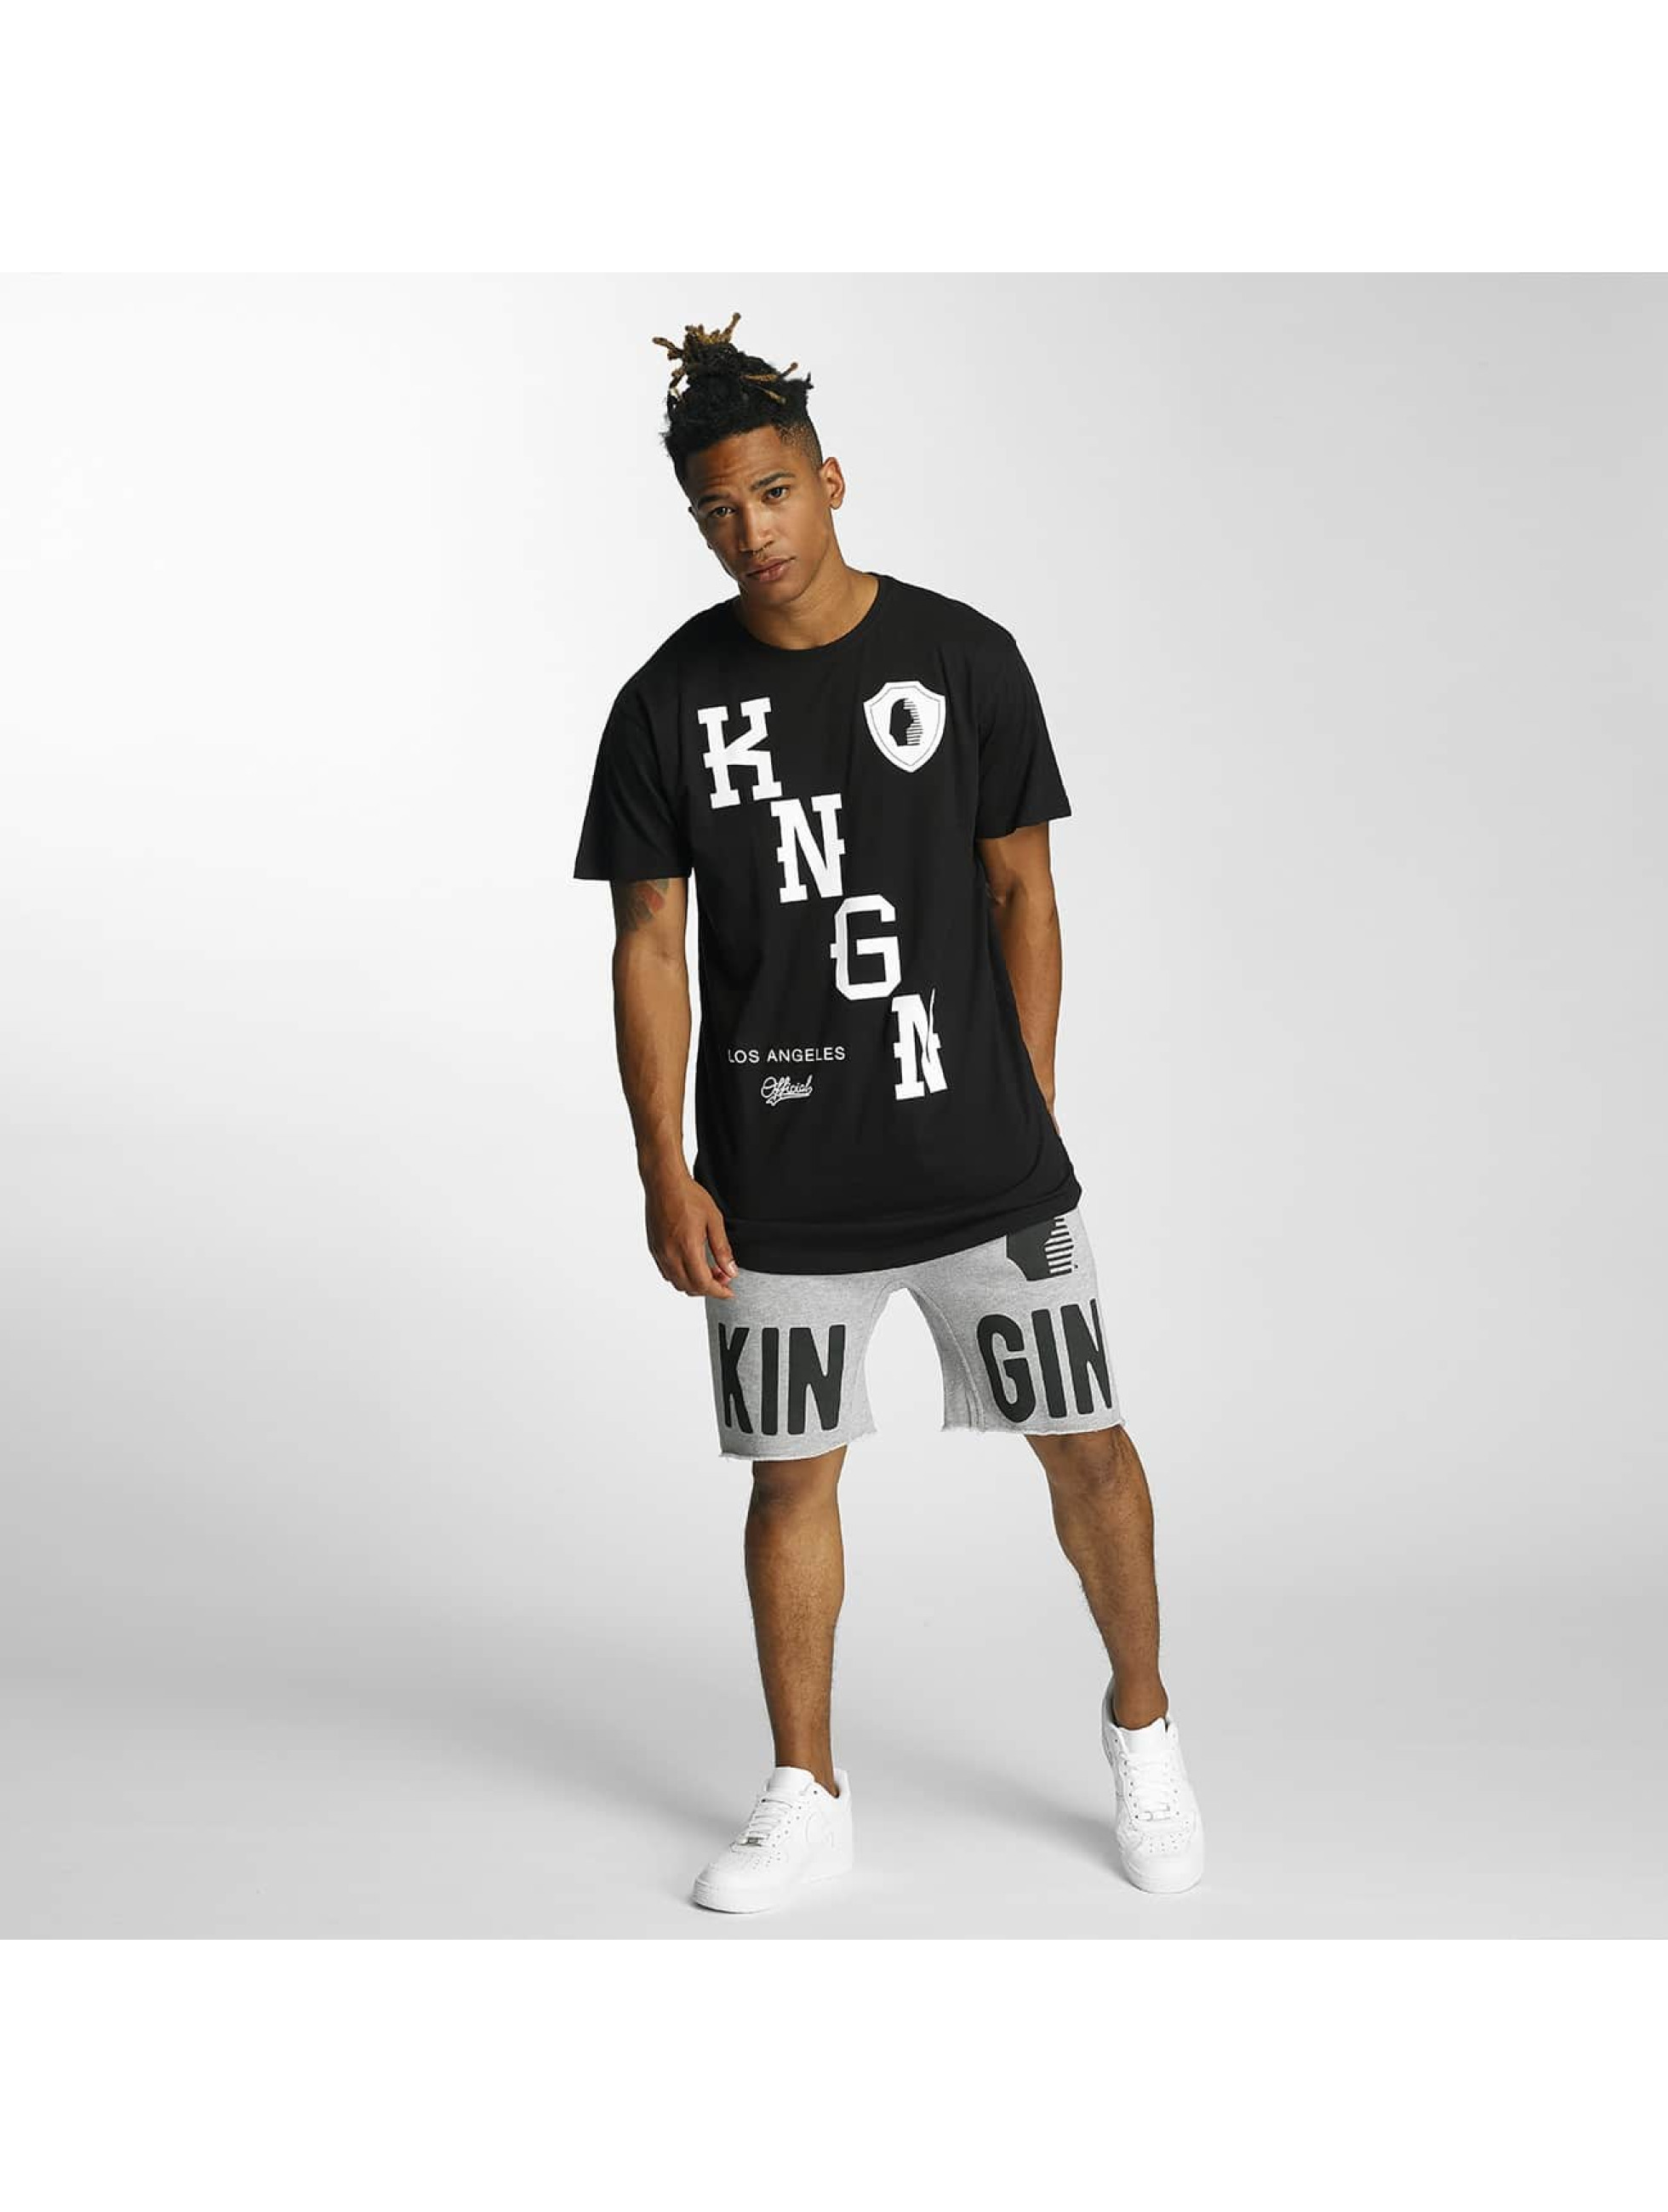 Kingin T-Shirt KNGN black